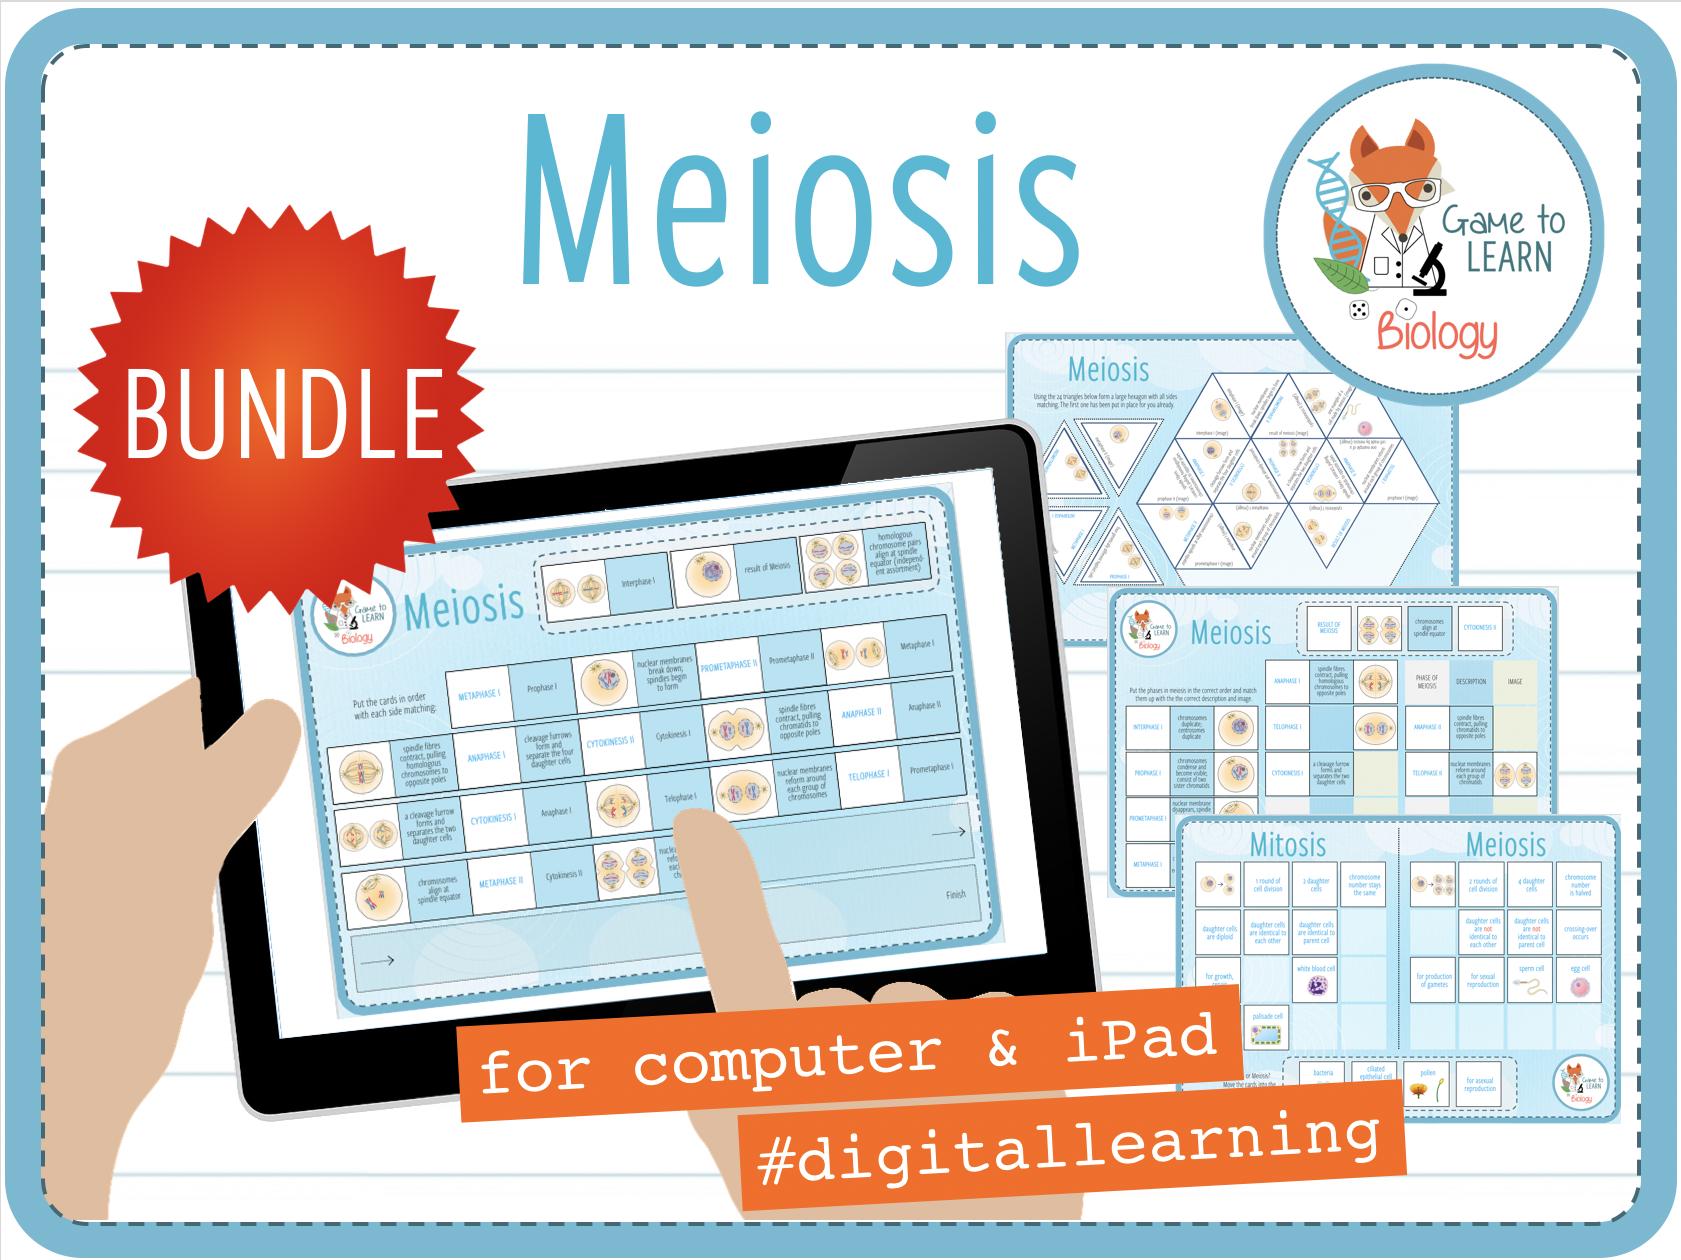 Meiosis - 4x Digital Games and Activities (KS4/5)